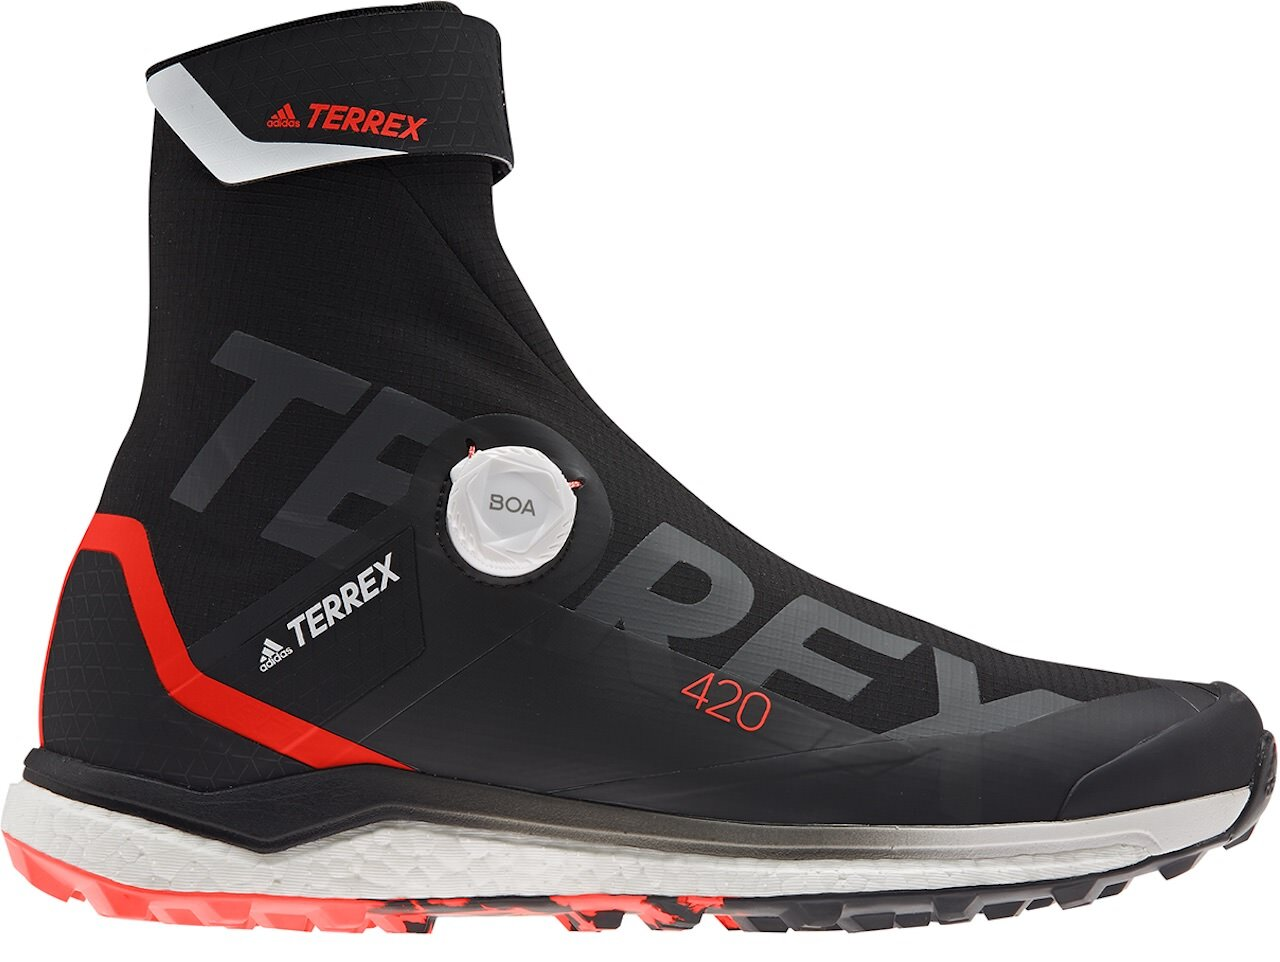 adidas_terrexagravic_pro